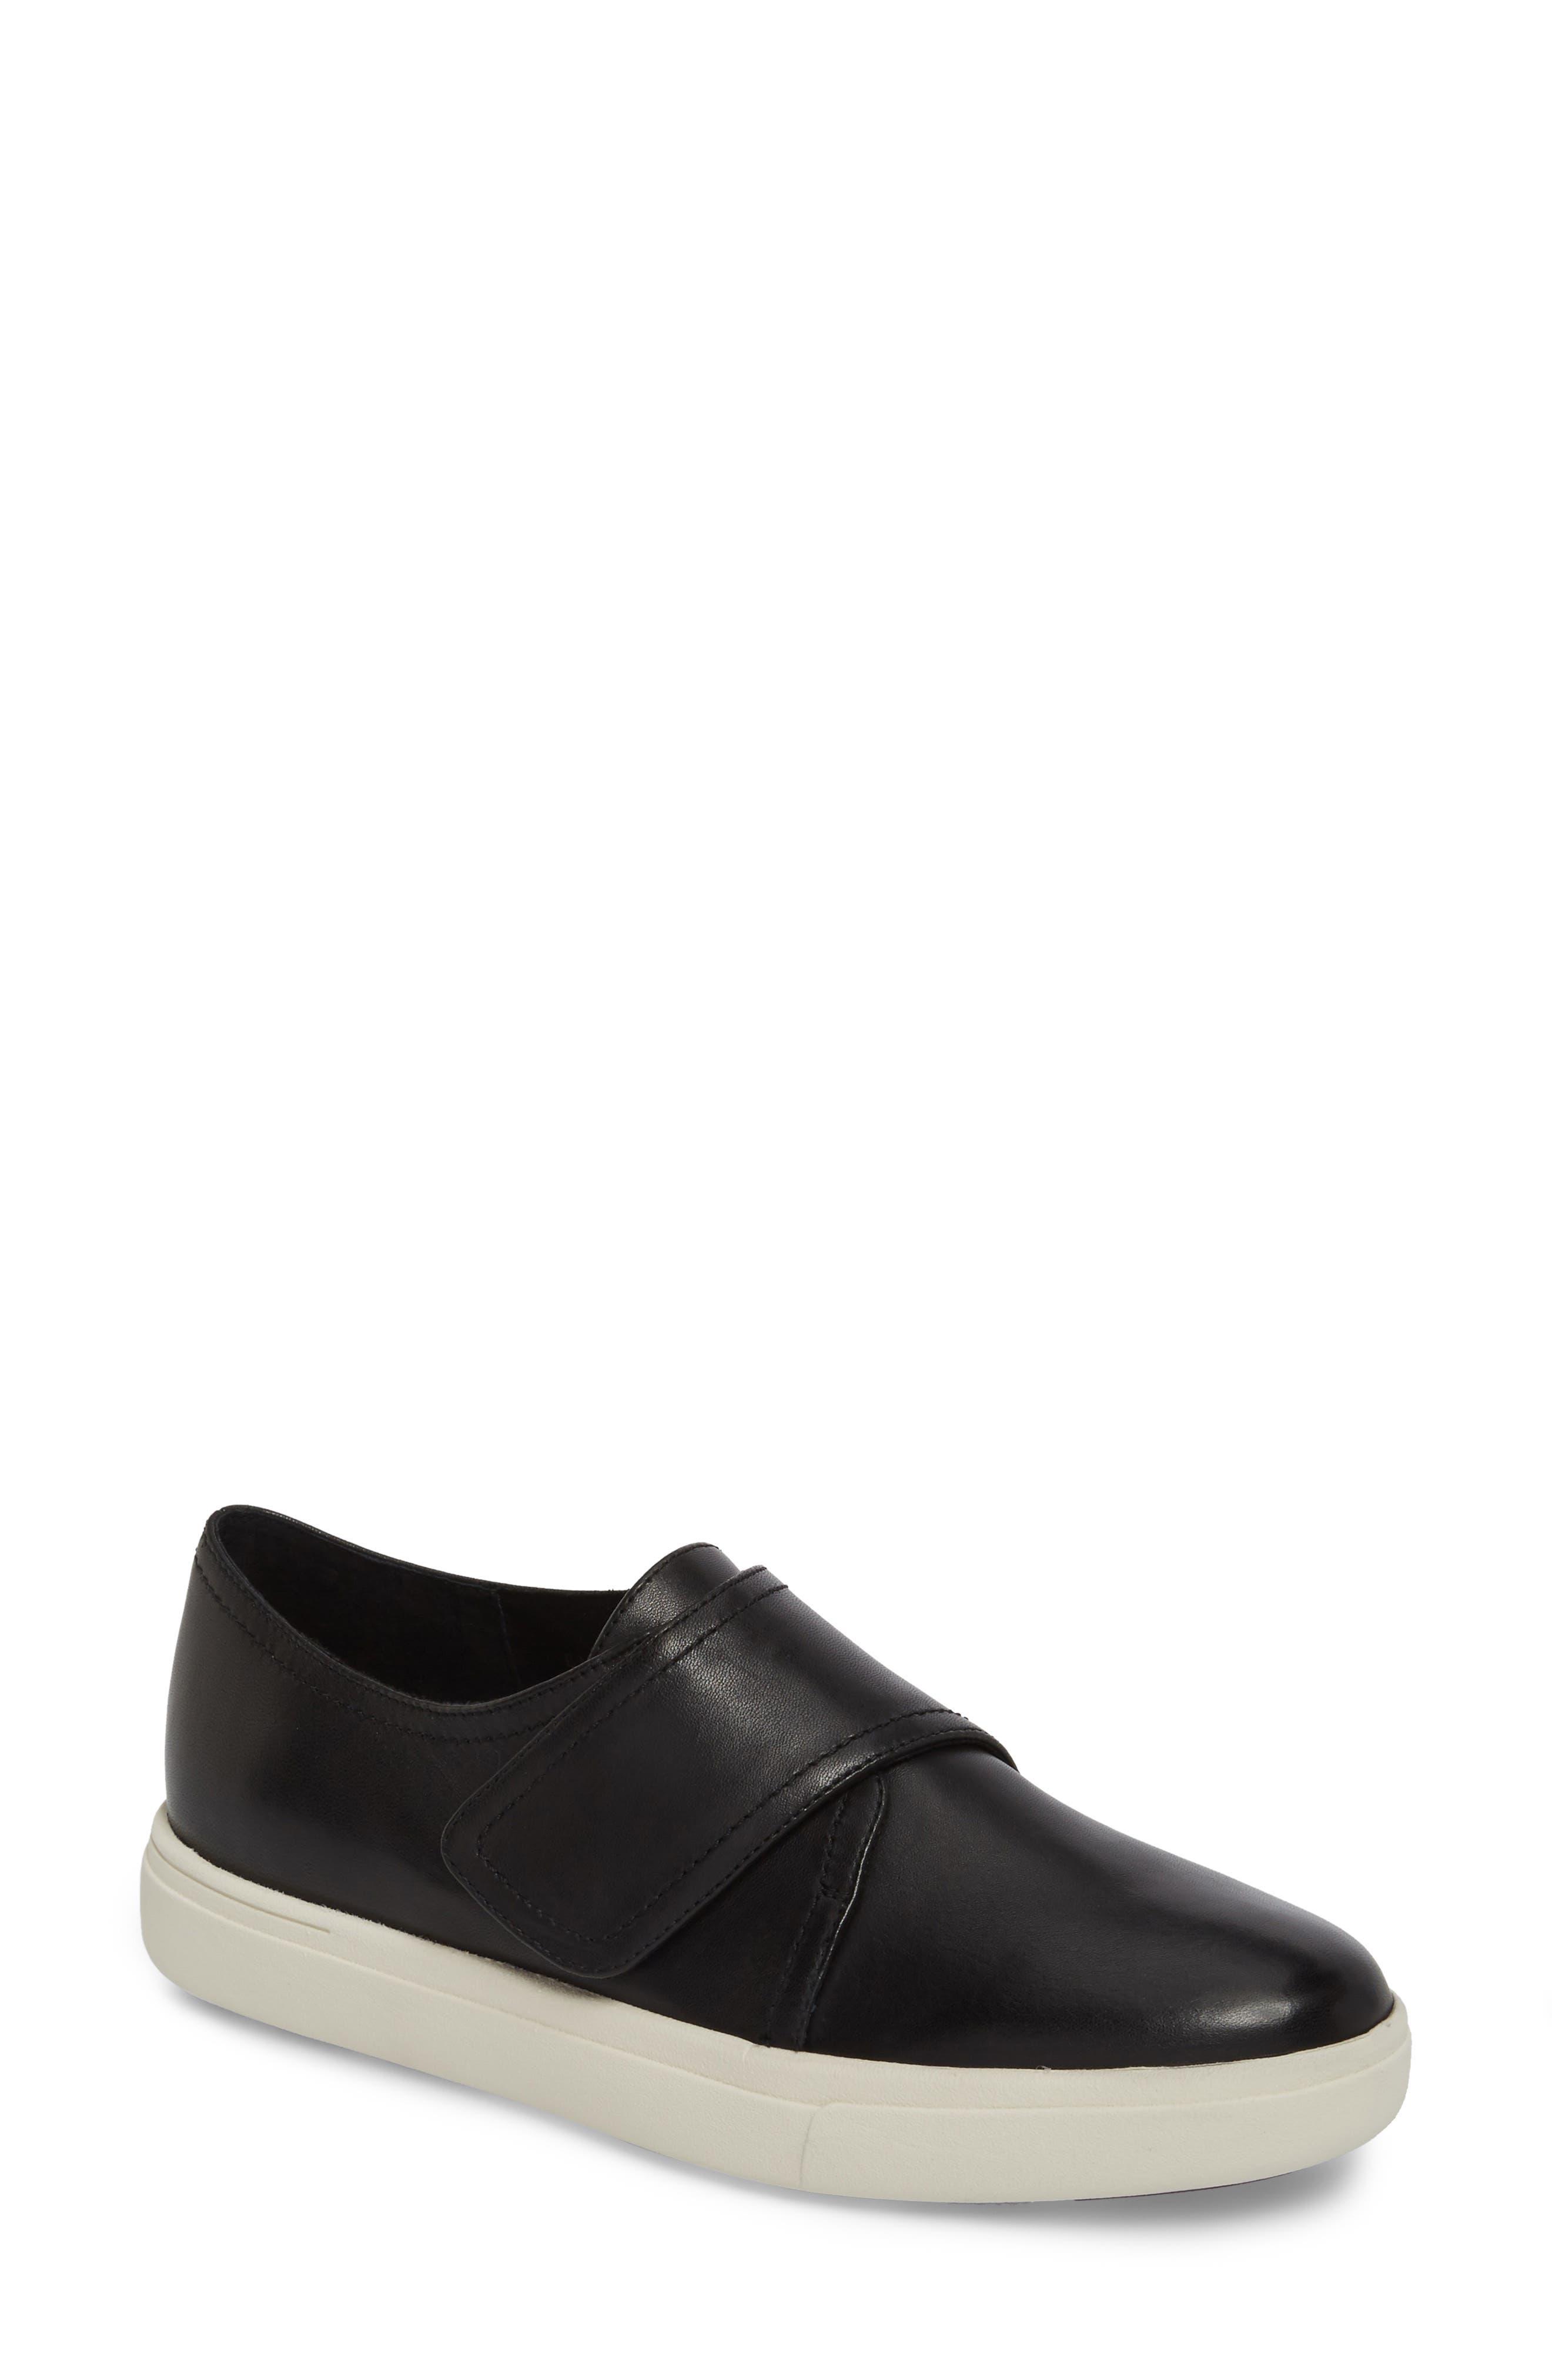 VANELi Oberon Slip-On Sneaker (Women)